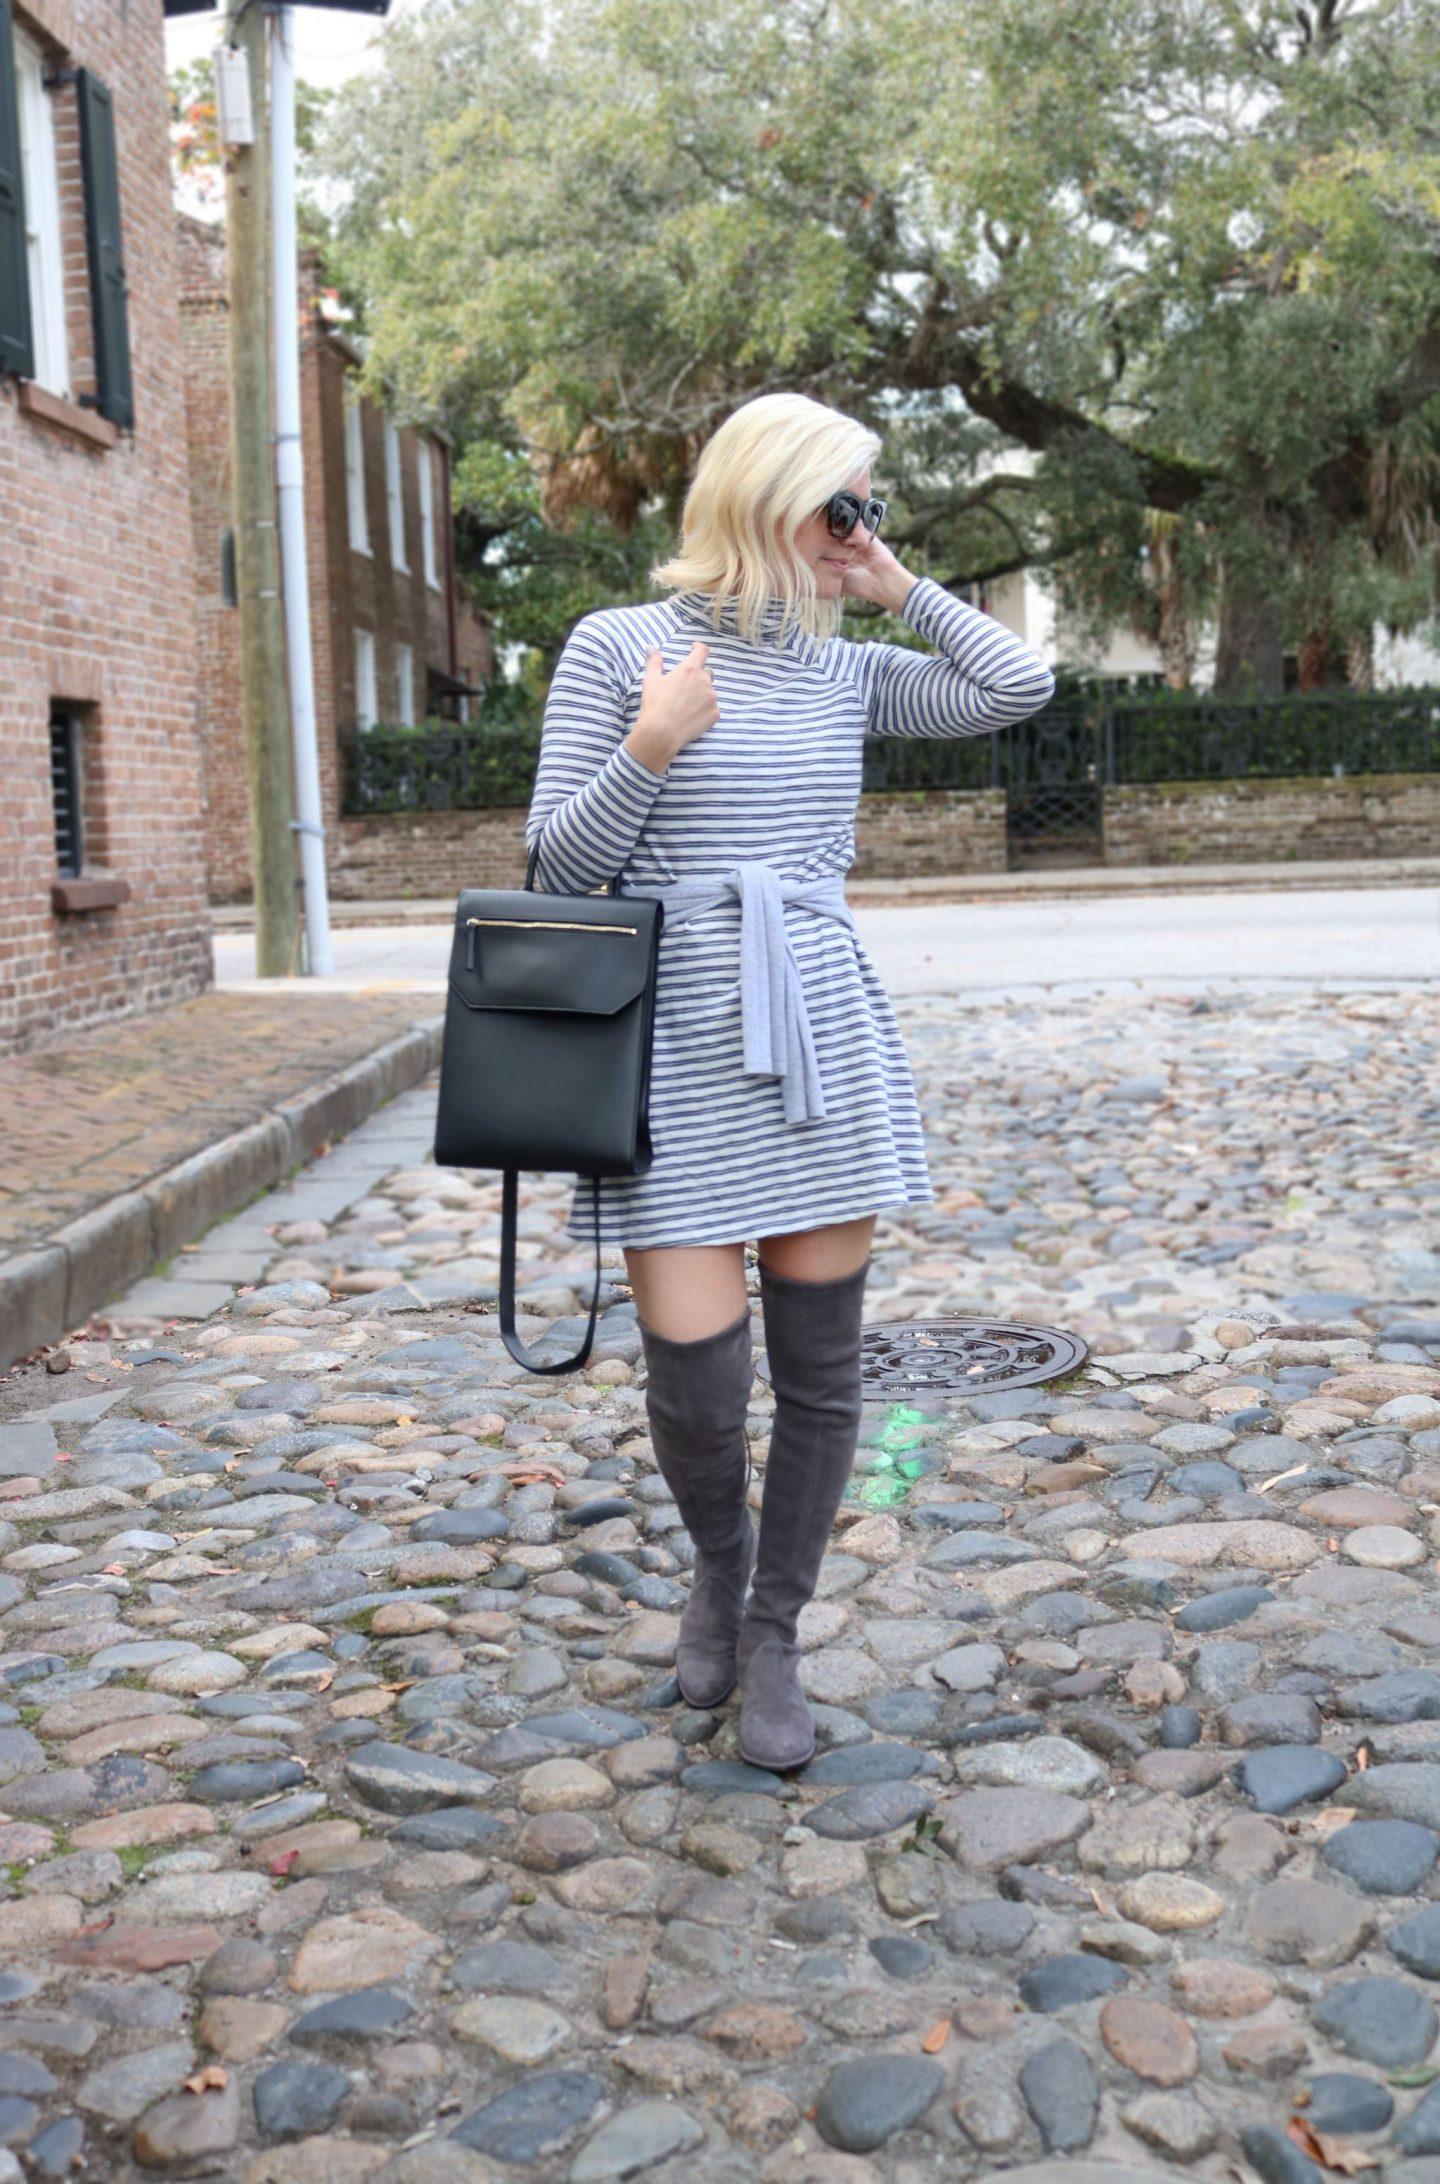 turtleneck striped dress, abercrombie, chandra keyser, #ootd, #lowlandboots, lowland stuart weitzman boots, #otkboots